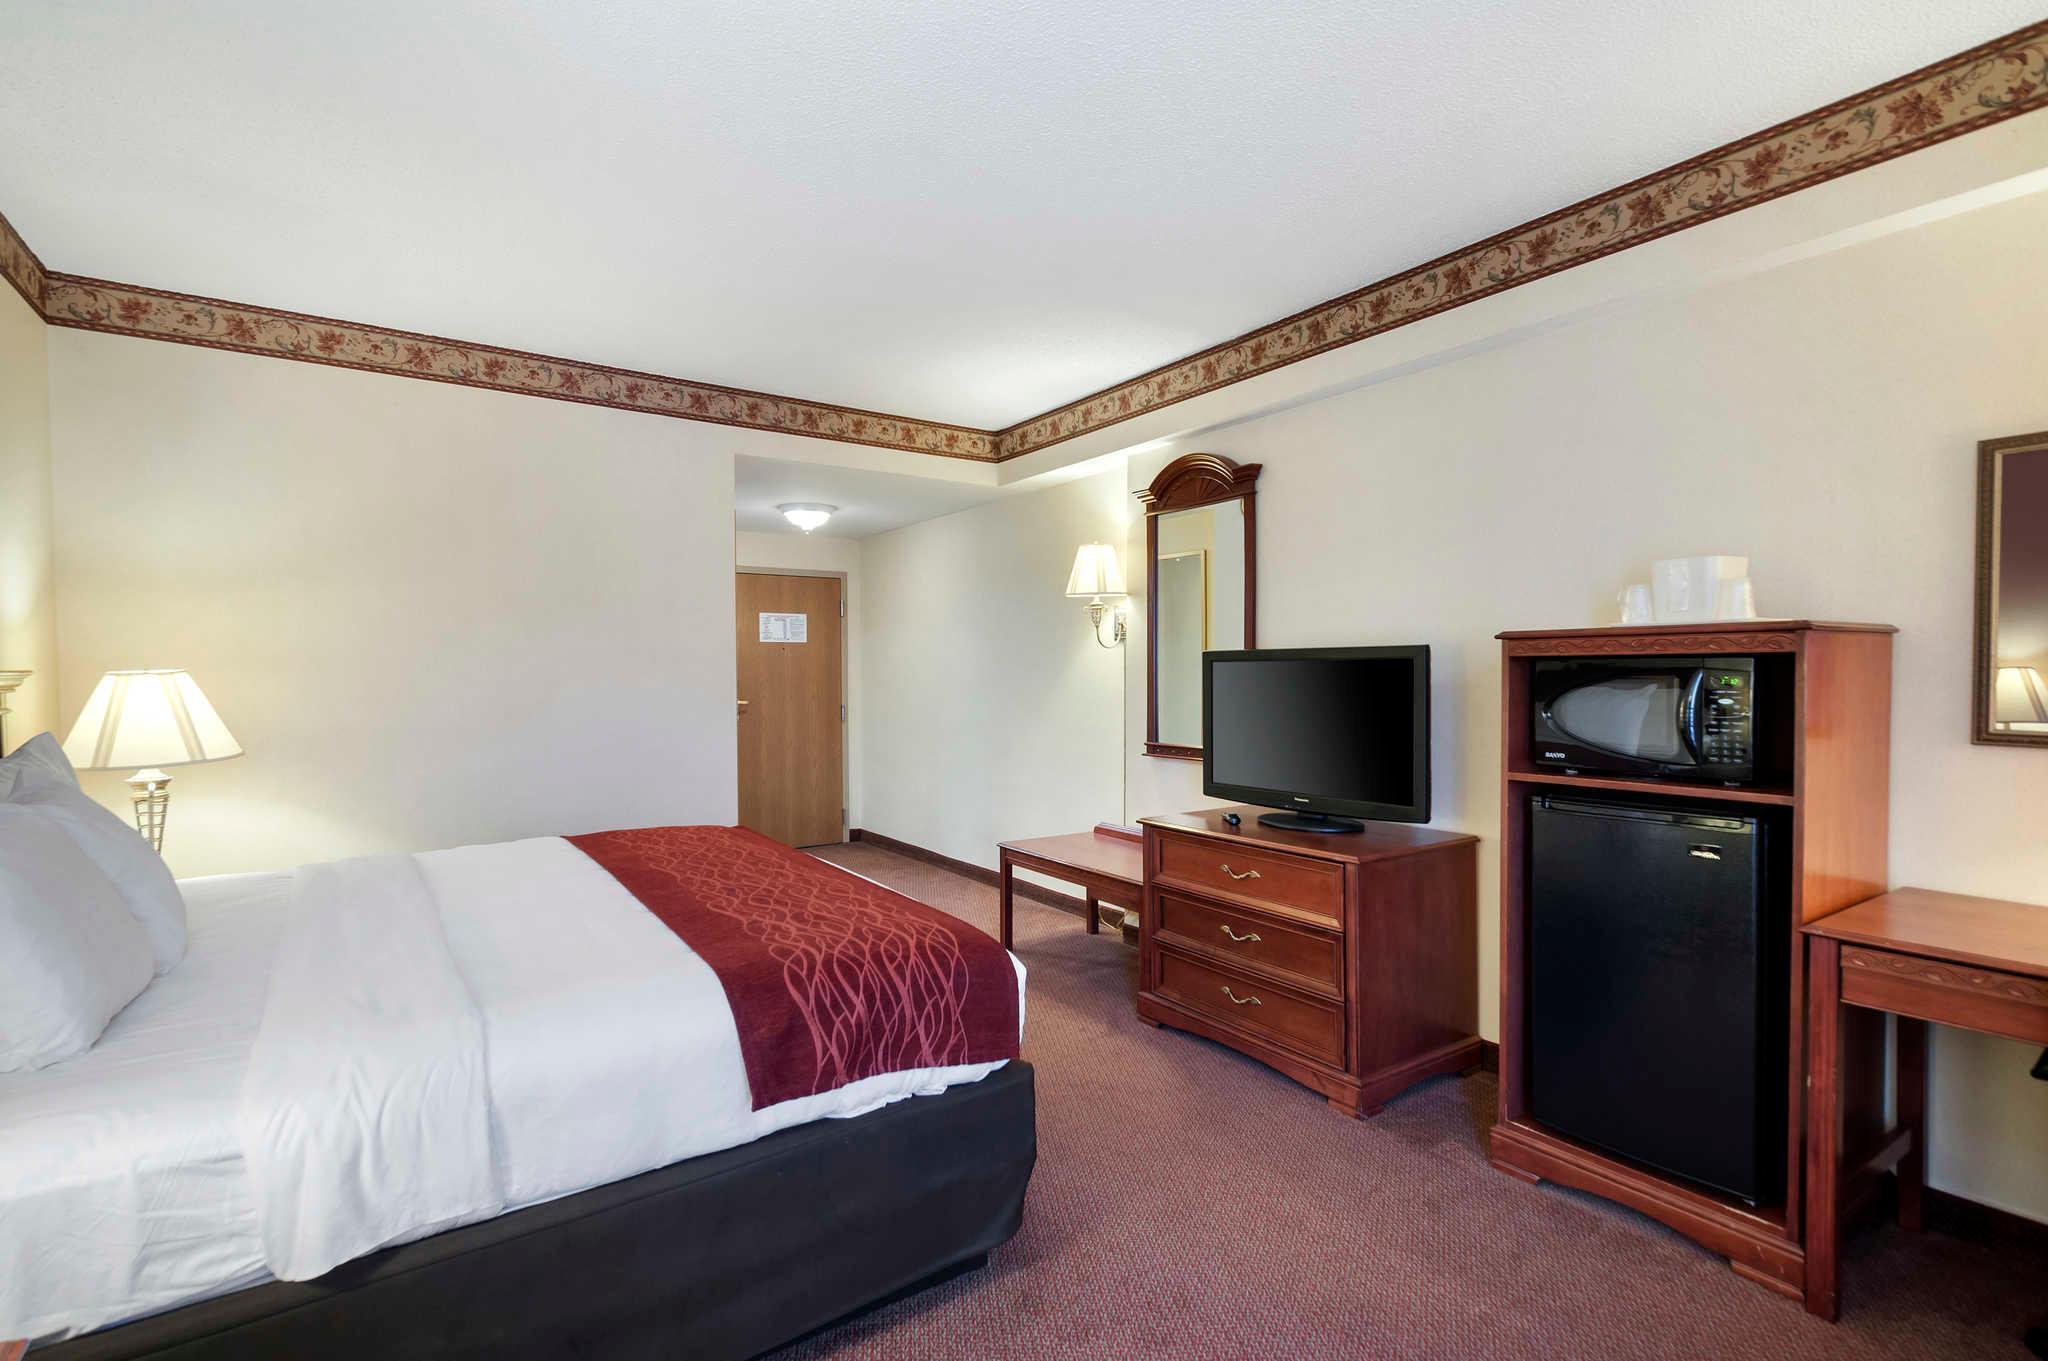 Comfort Inn & Suites Edgewood - Aberdeen image 10